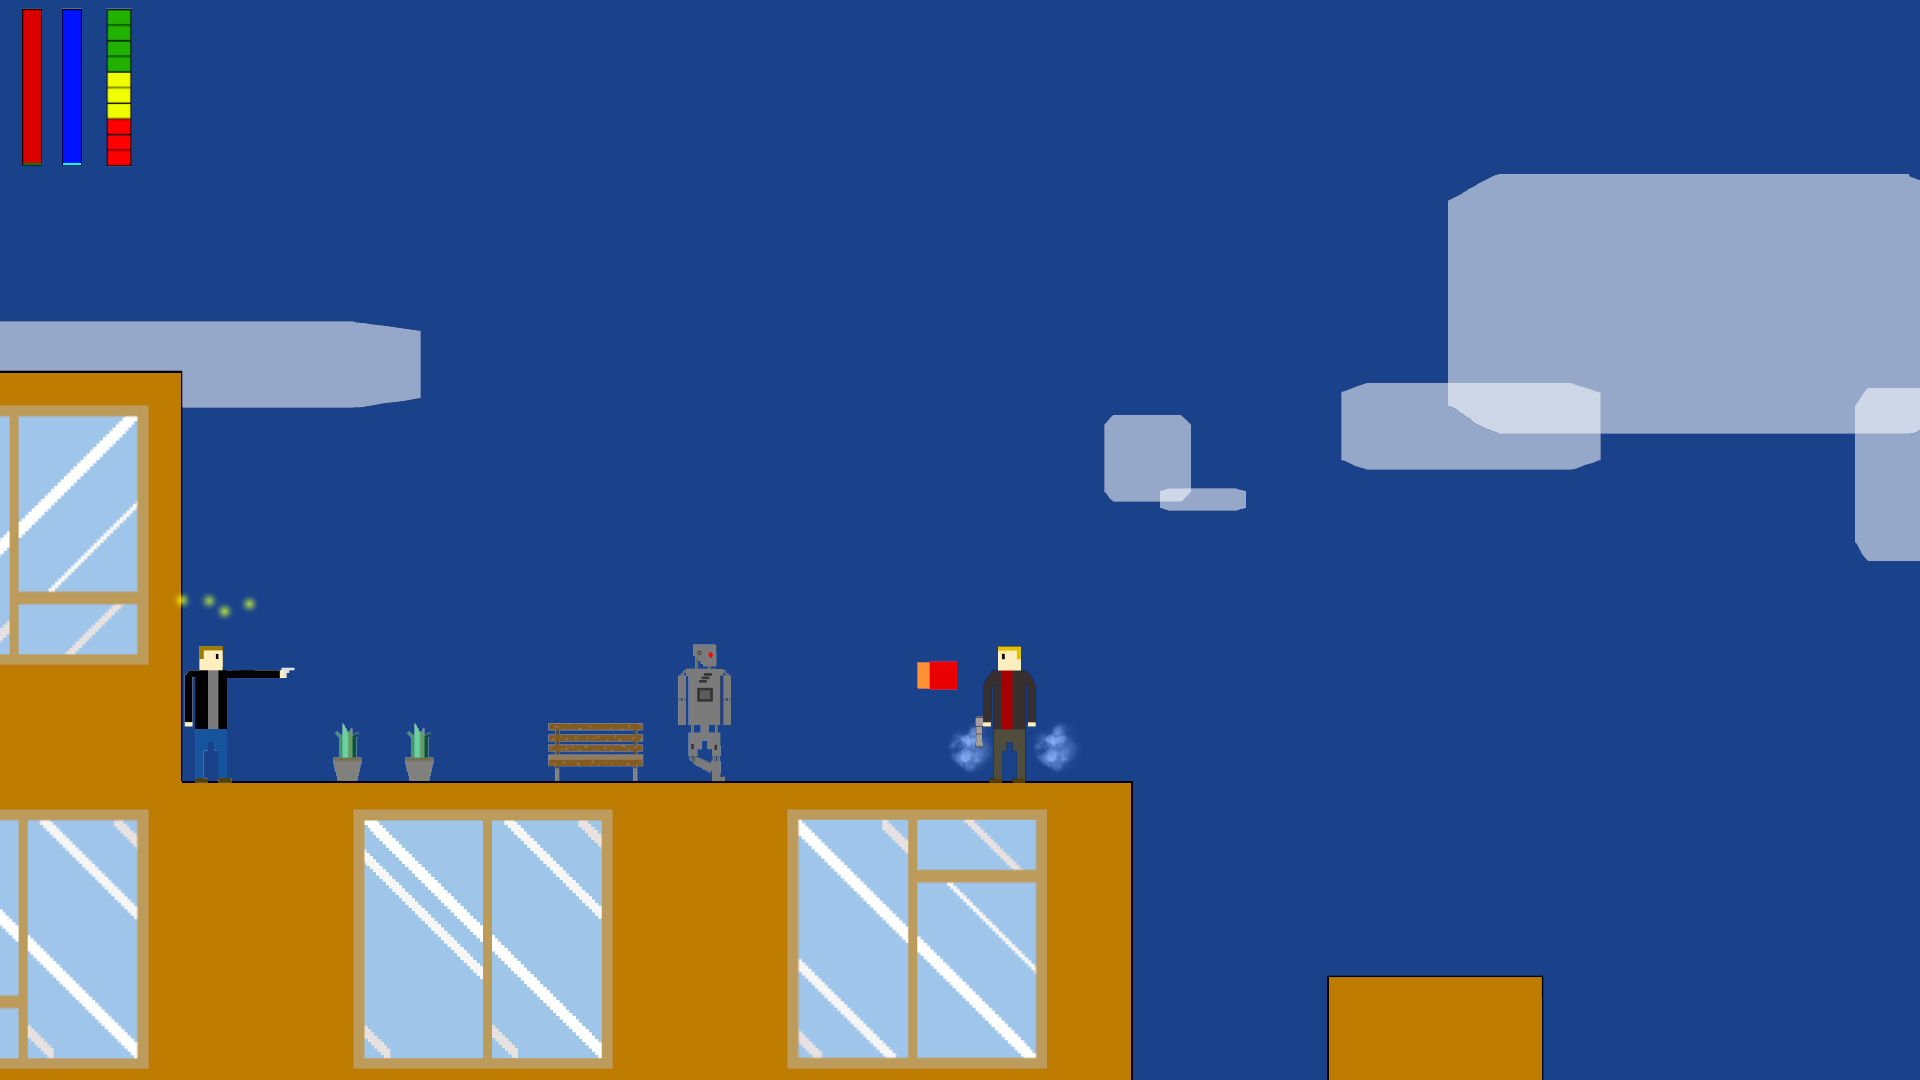 gameplay screen 6.jpg